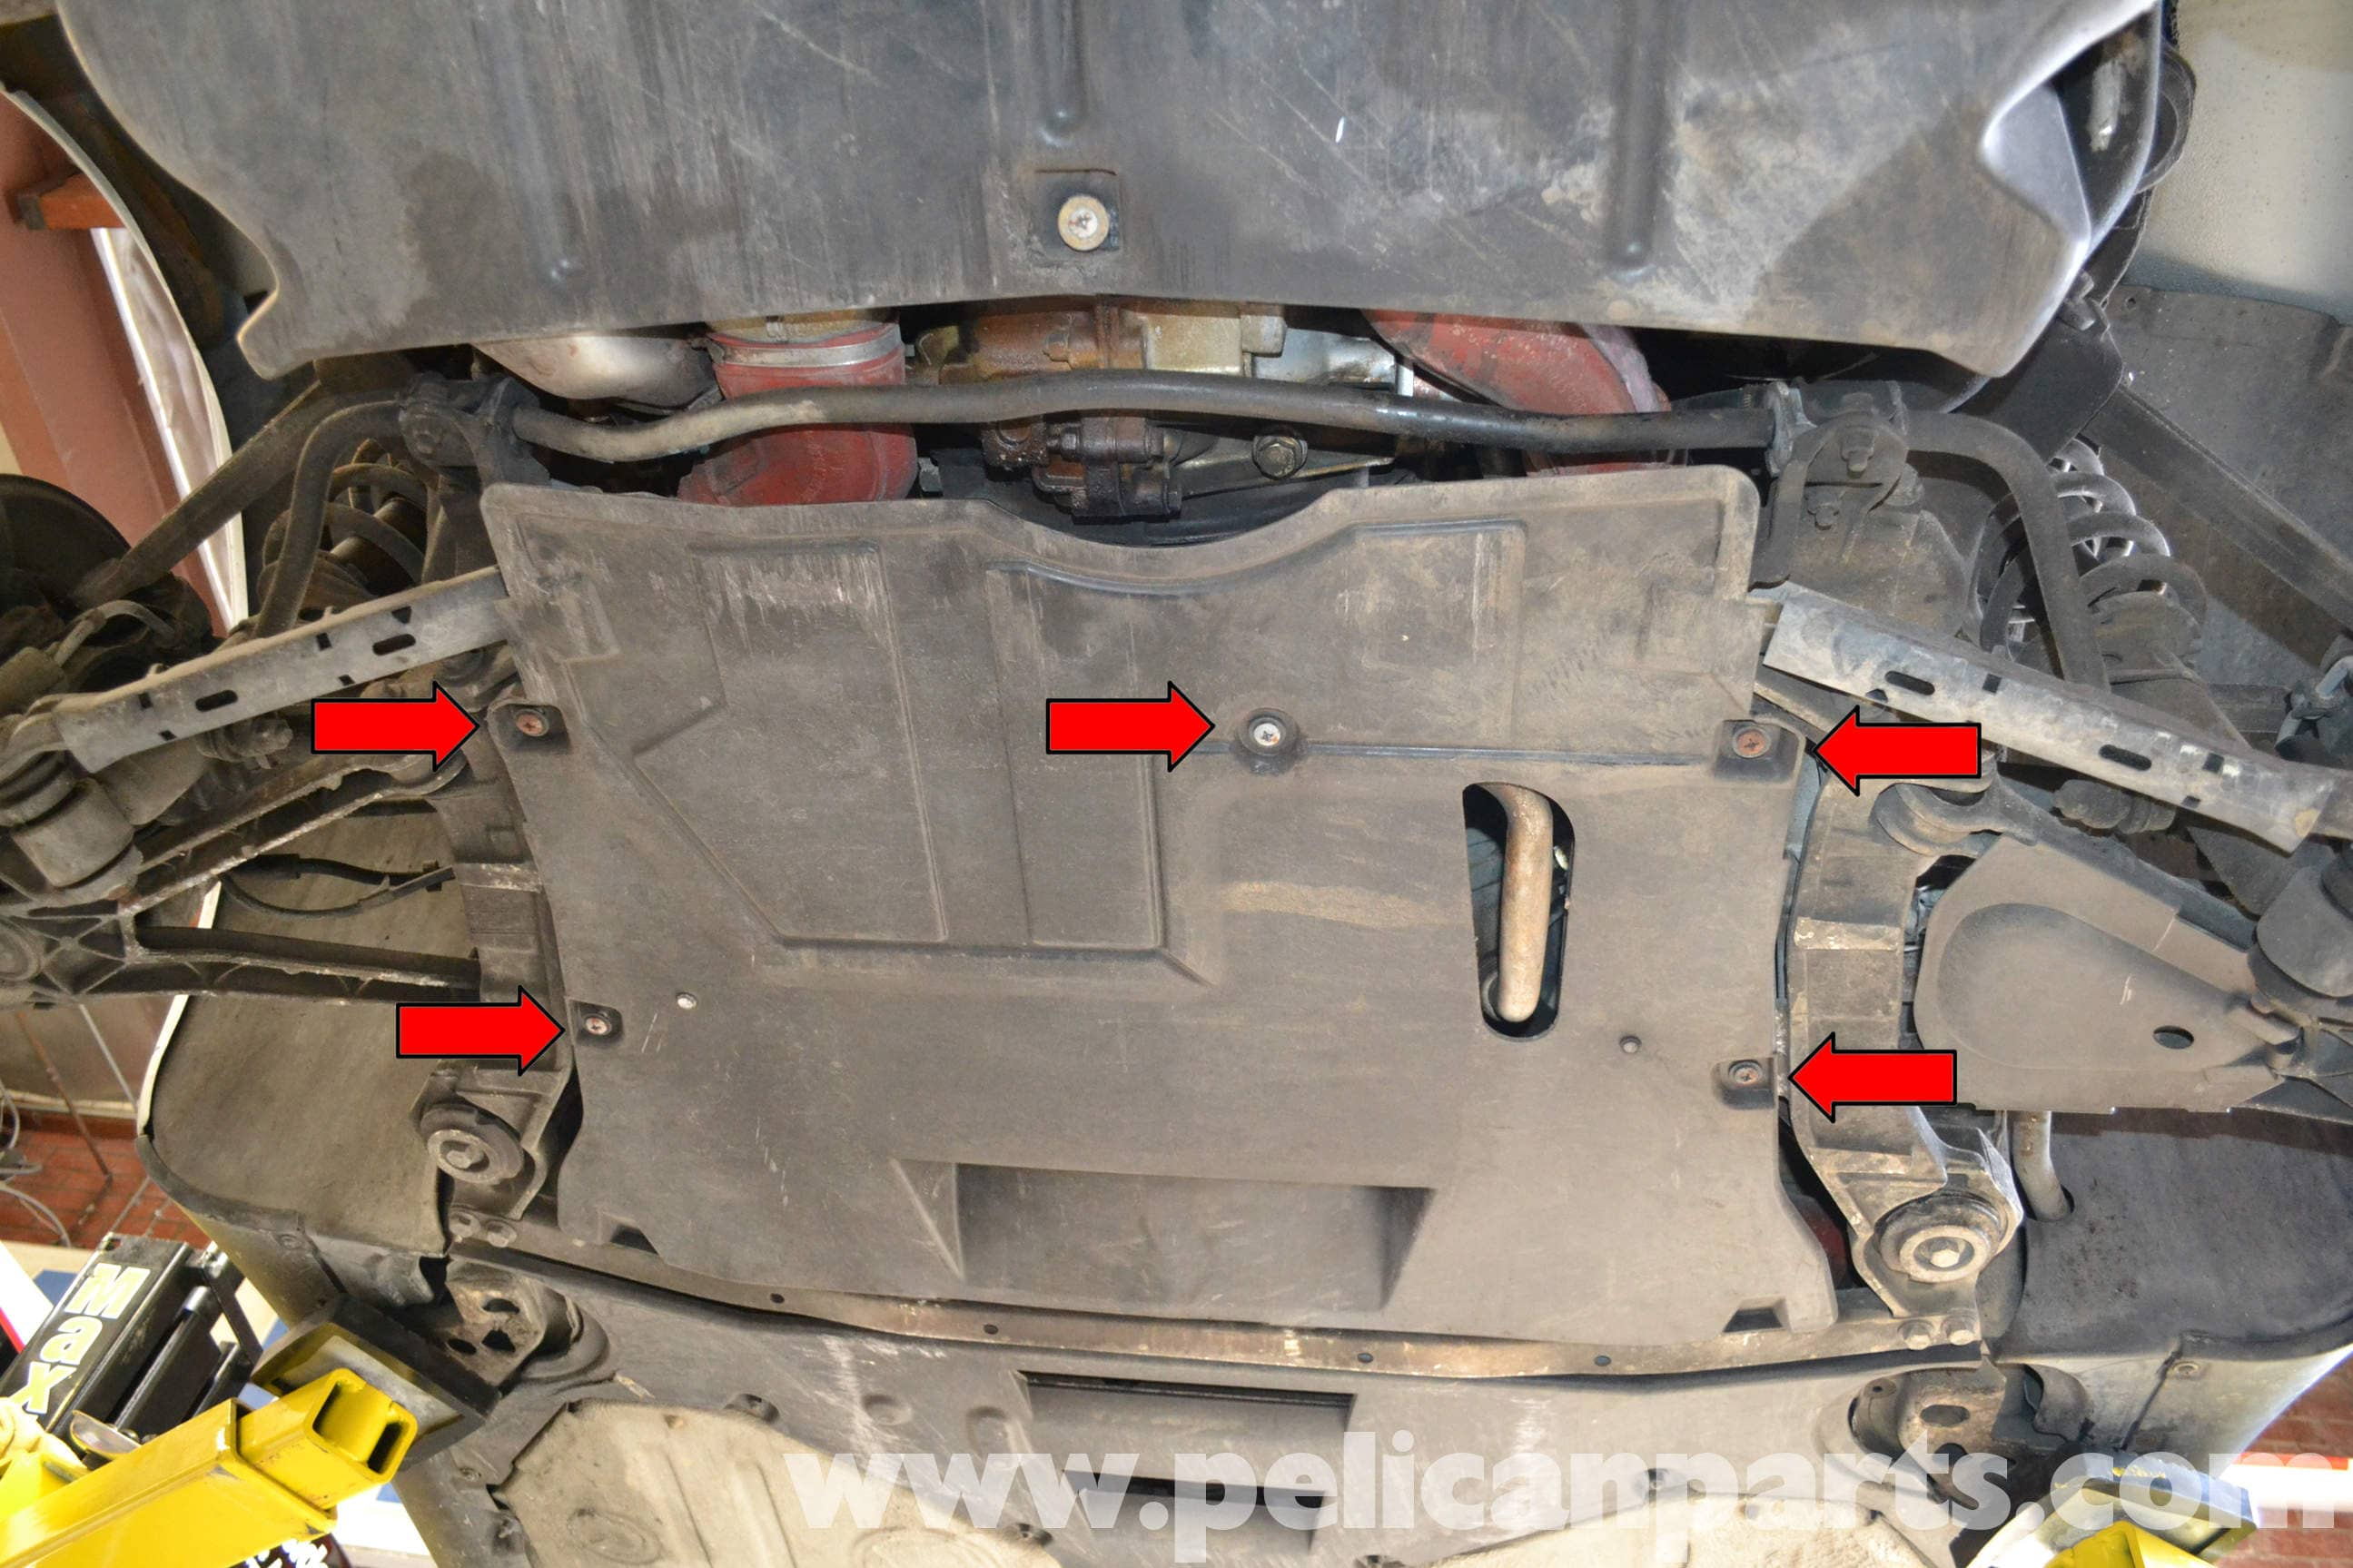 Pelican Technical Article Porsche 993 Under Engine Trays